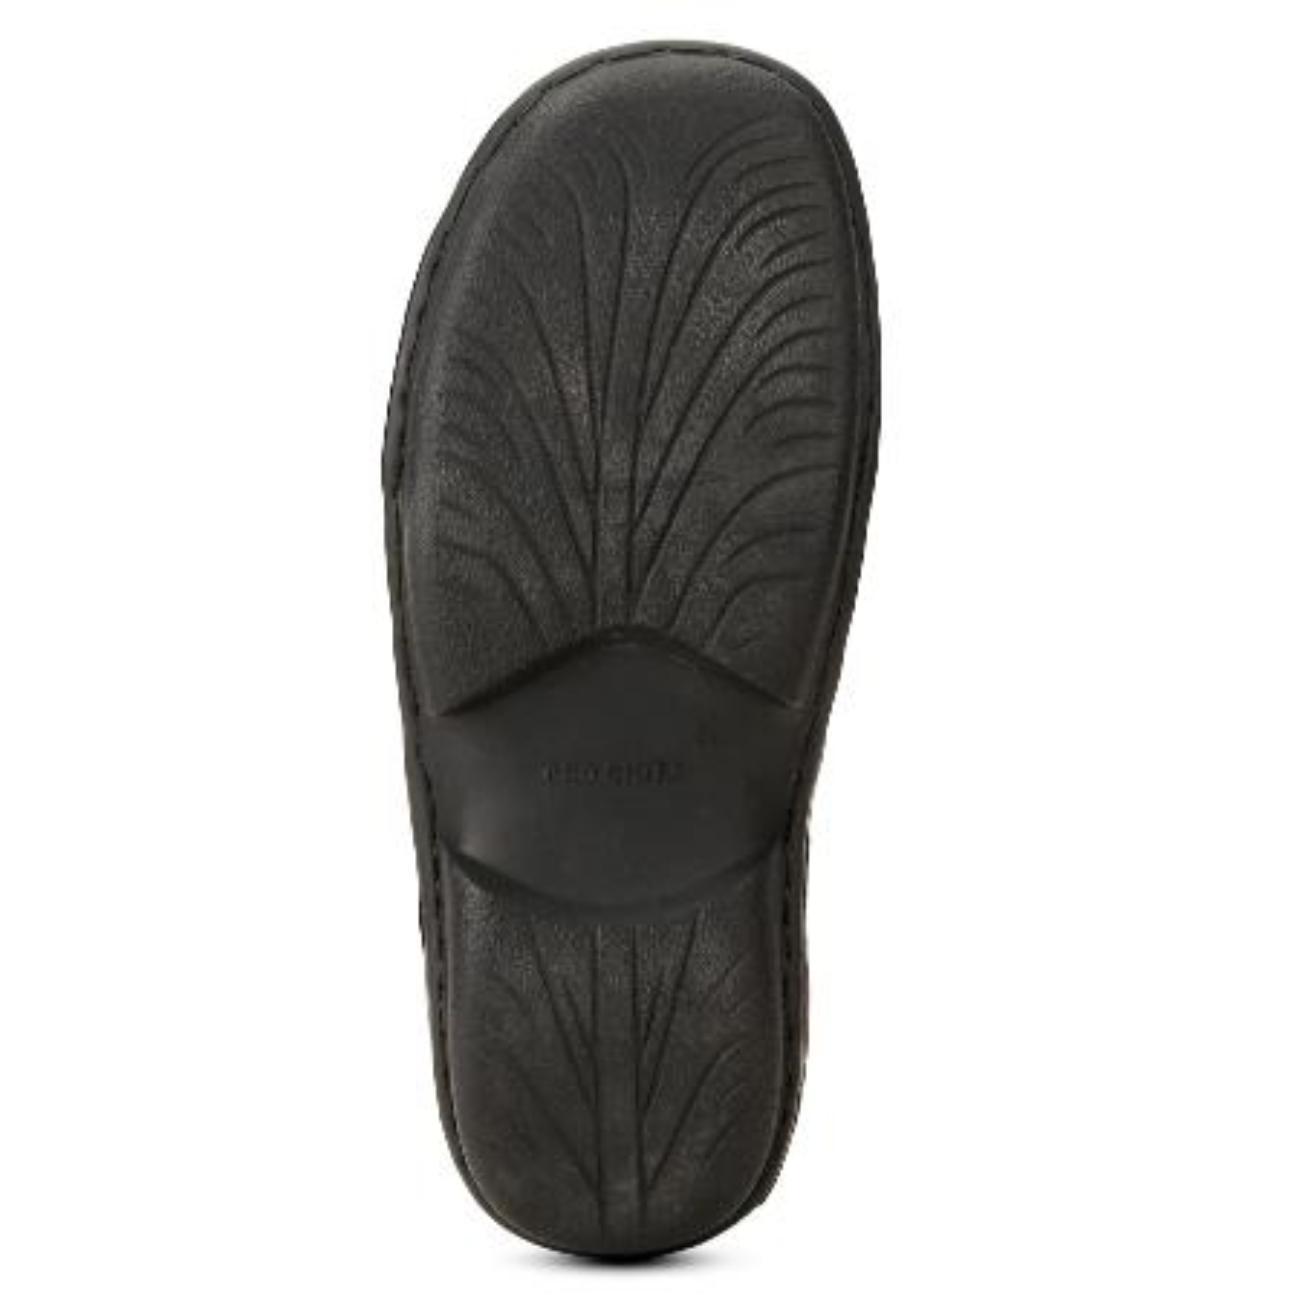 black slip-on slippers rubber sole